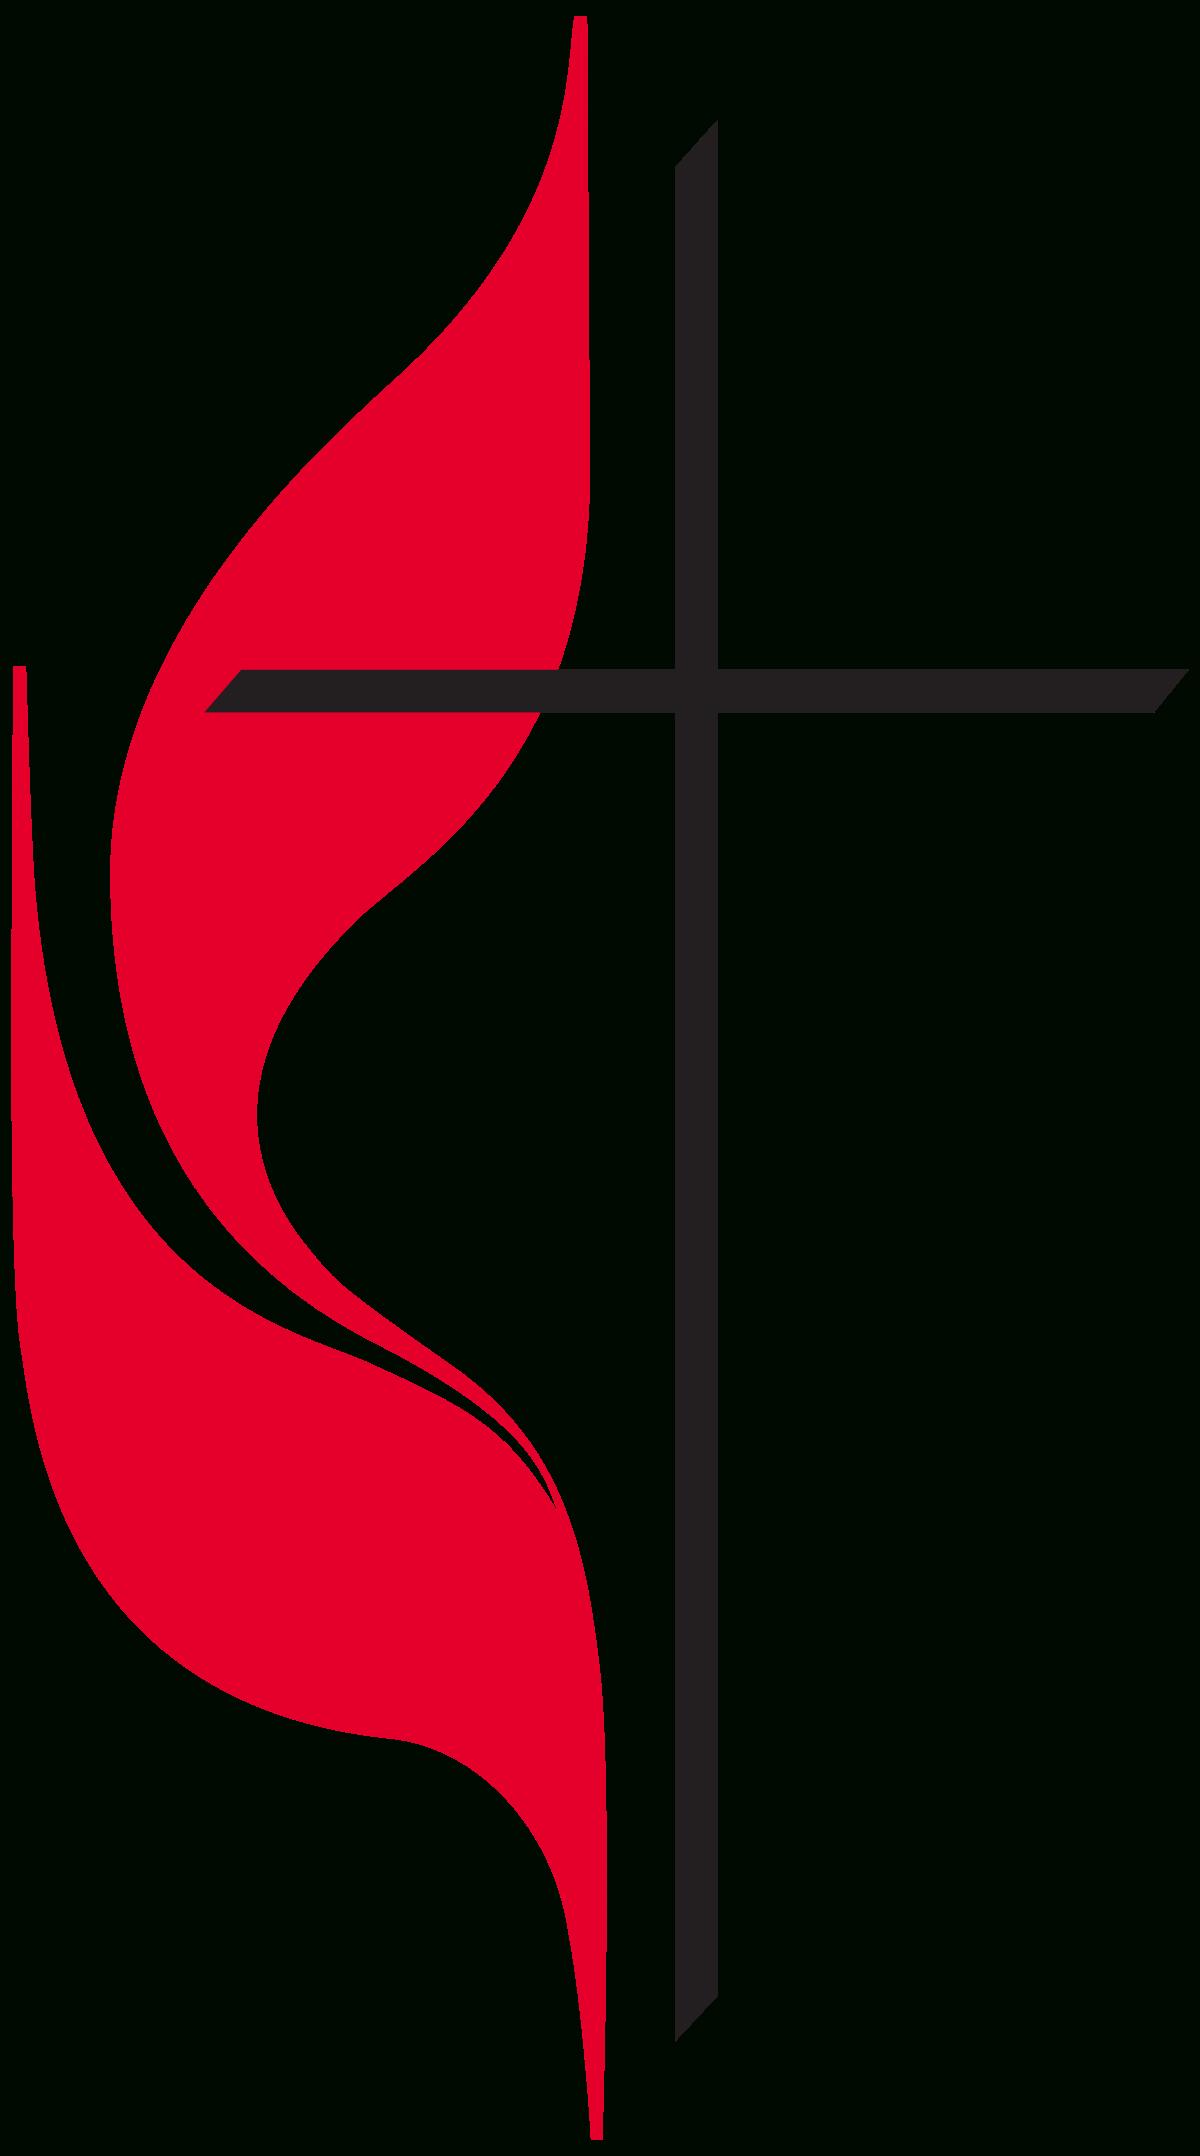 United Methodist Church In Norway - Wikipedia